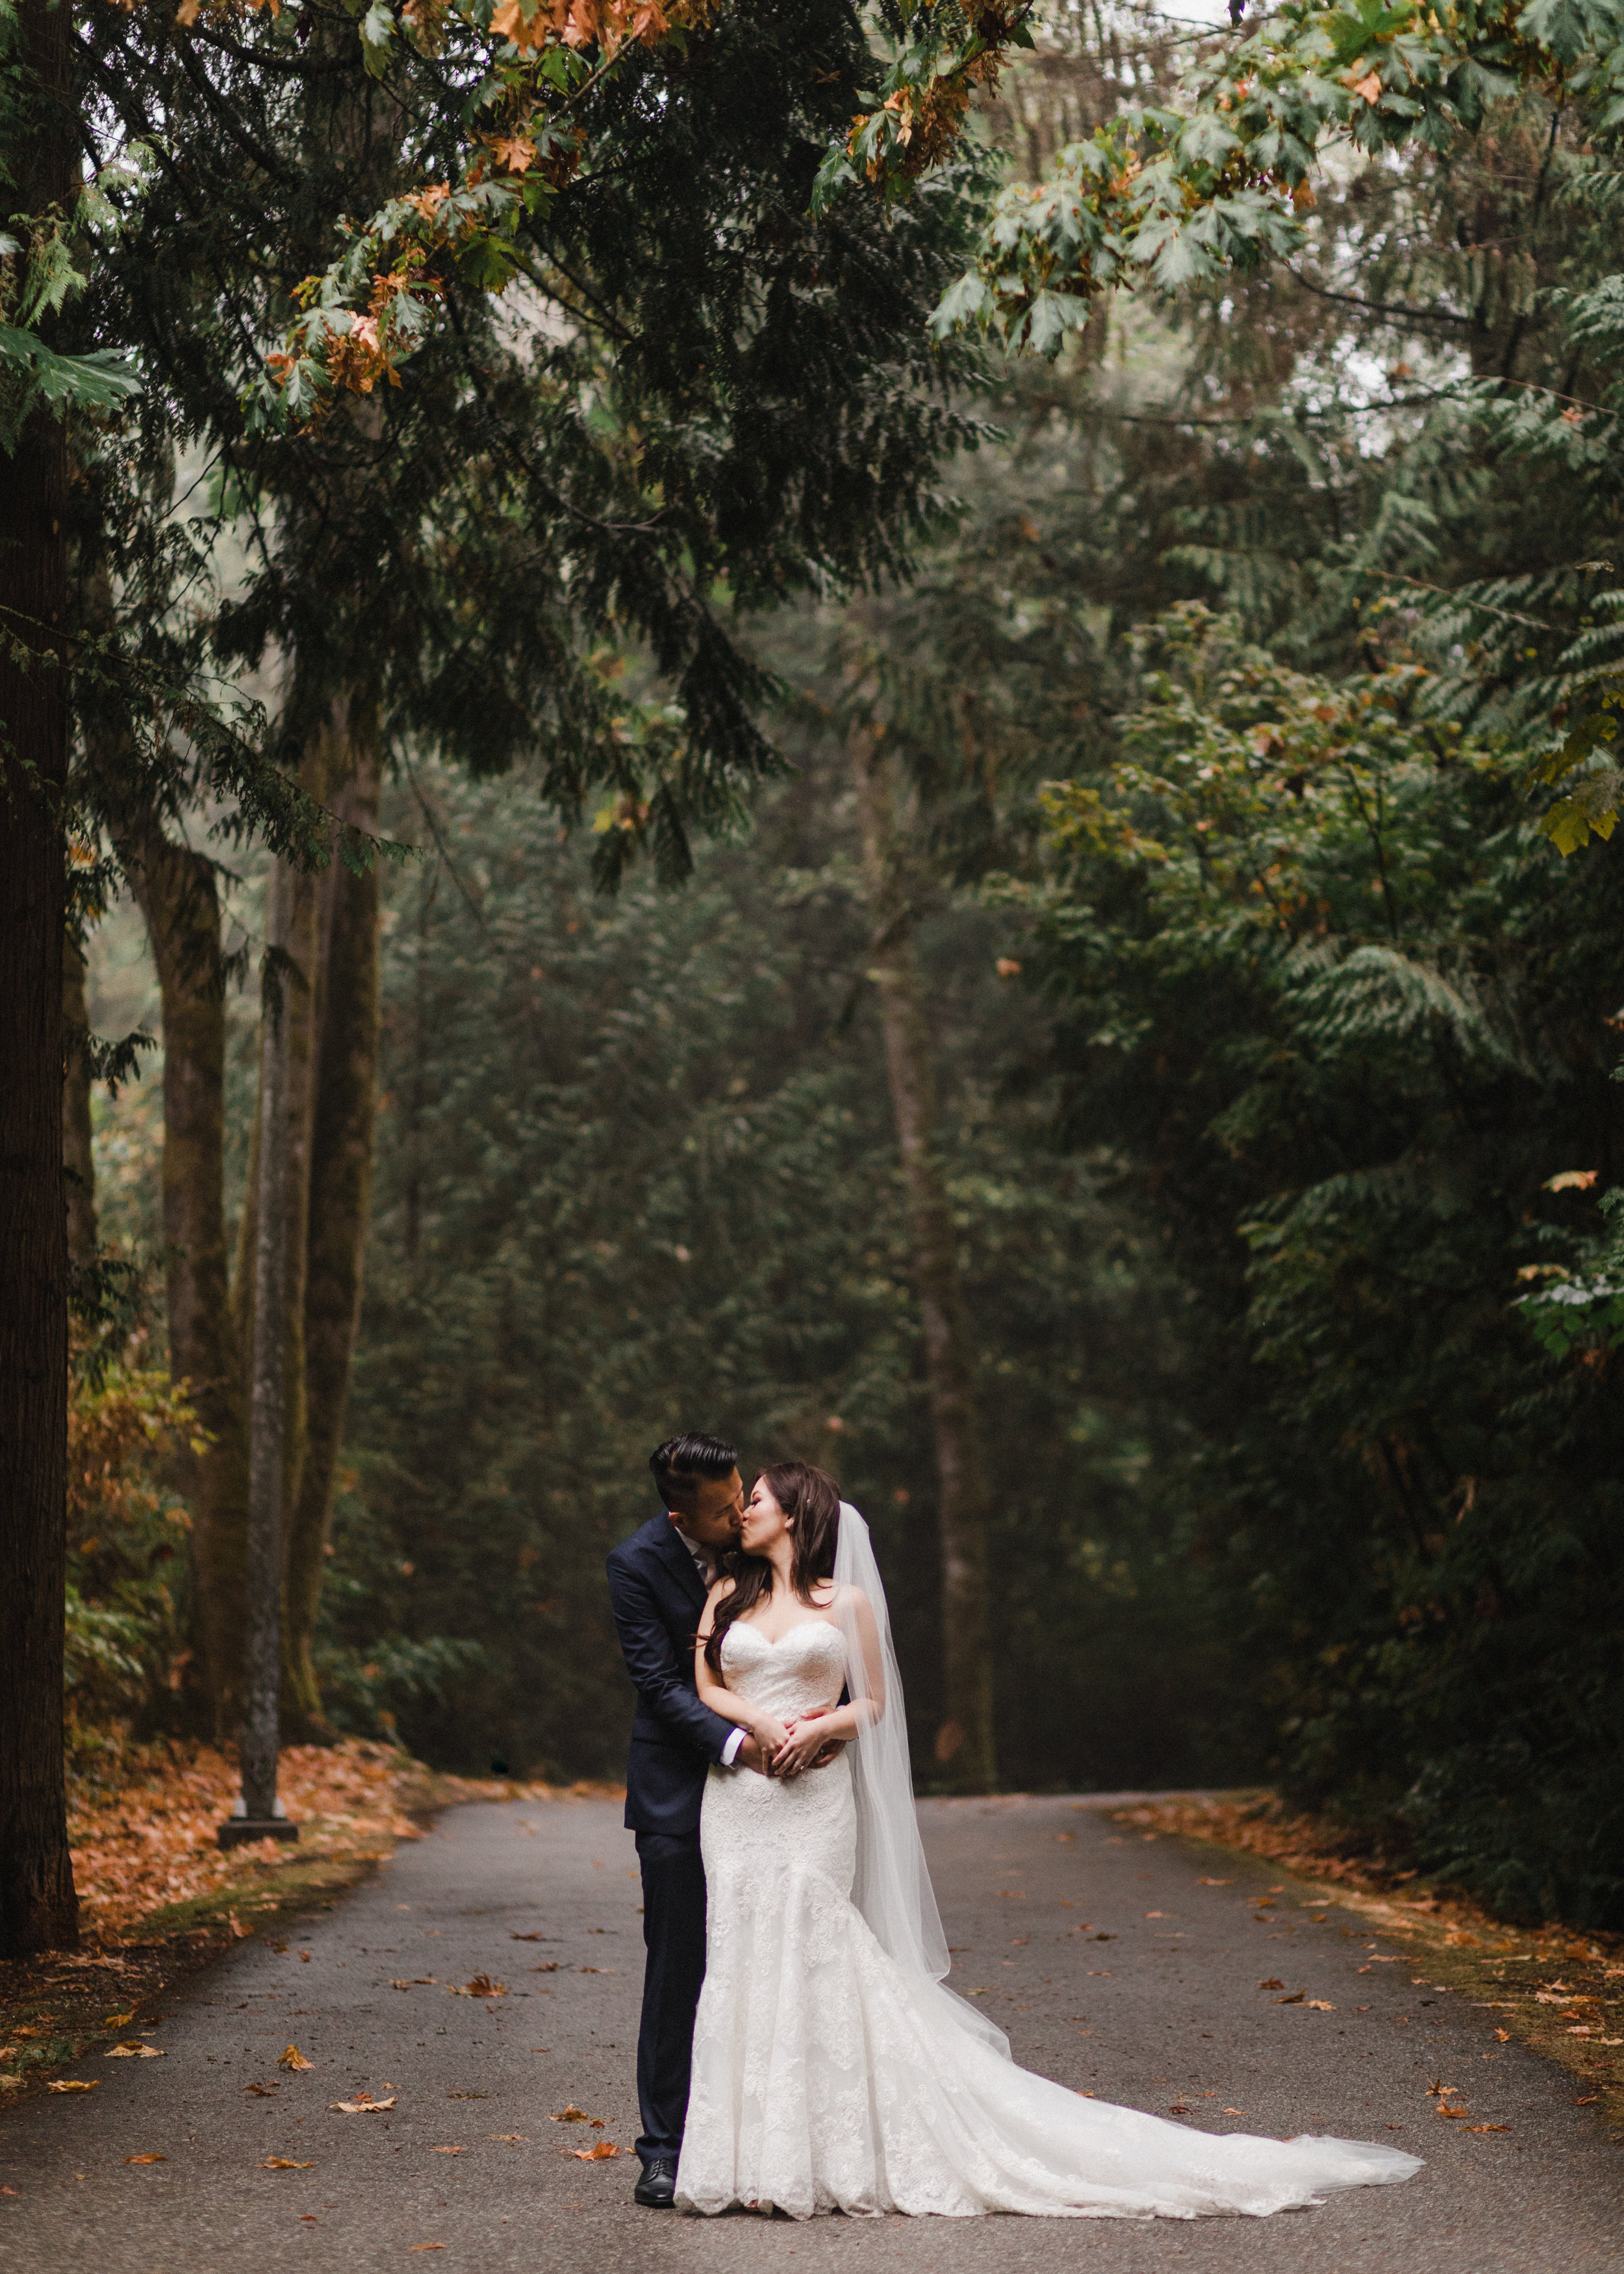 HeraStudios_Selects_Full_LianaJuliano_Wedding-393.jpg